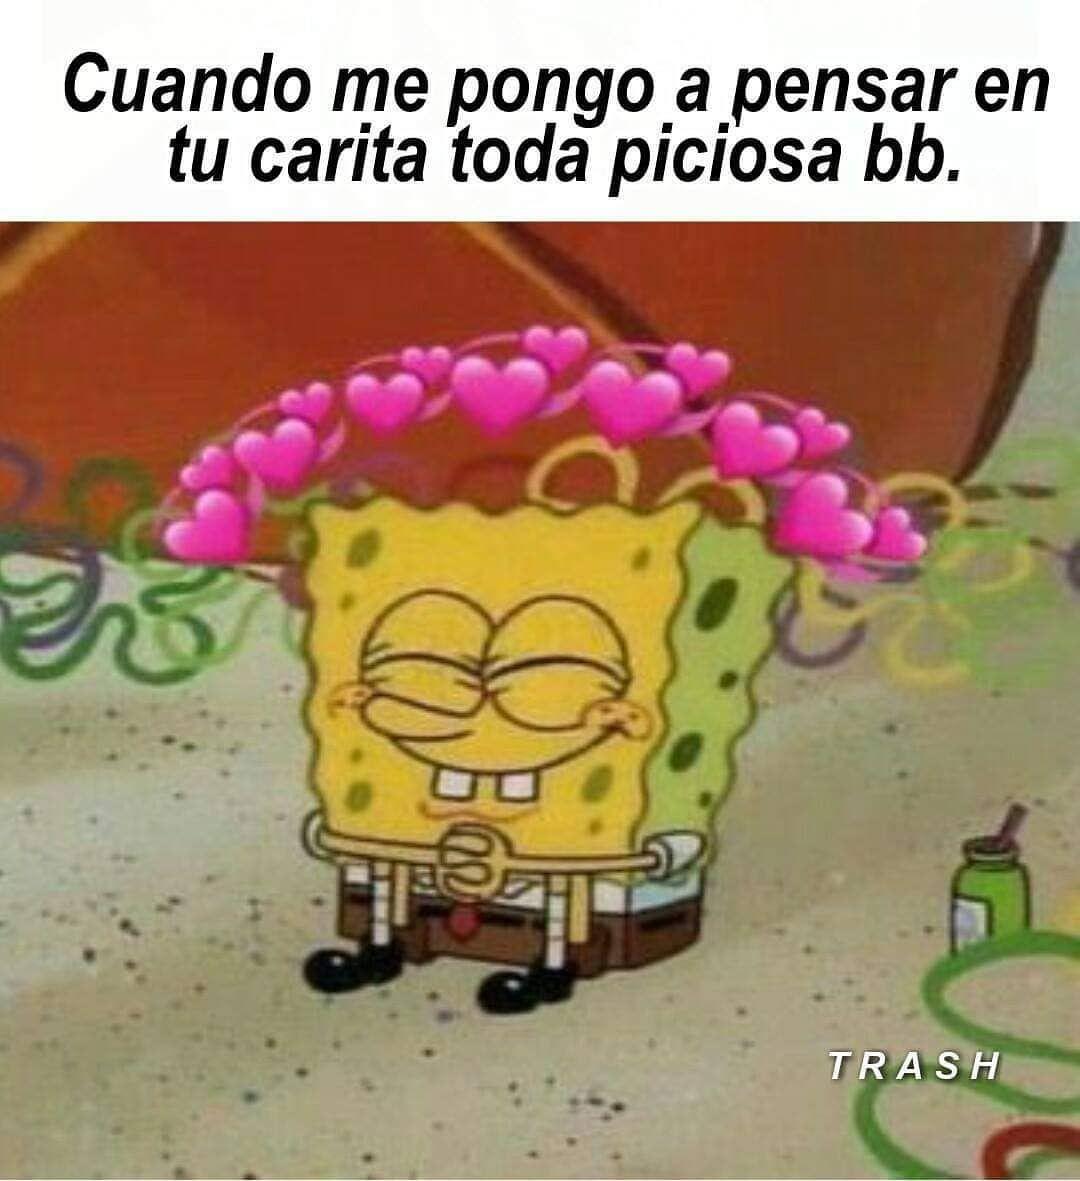 Publicacion De Instagram De T R A S H 2 De Mar De 2019 A Las 11 25 Utc Funny Boyfriend Memes Funny Relationship Memes Cute Love Memes